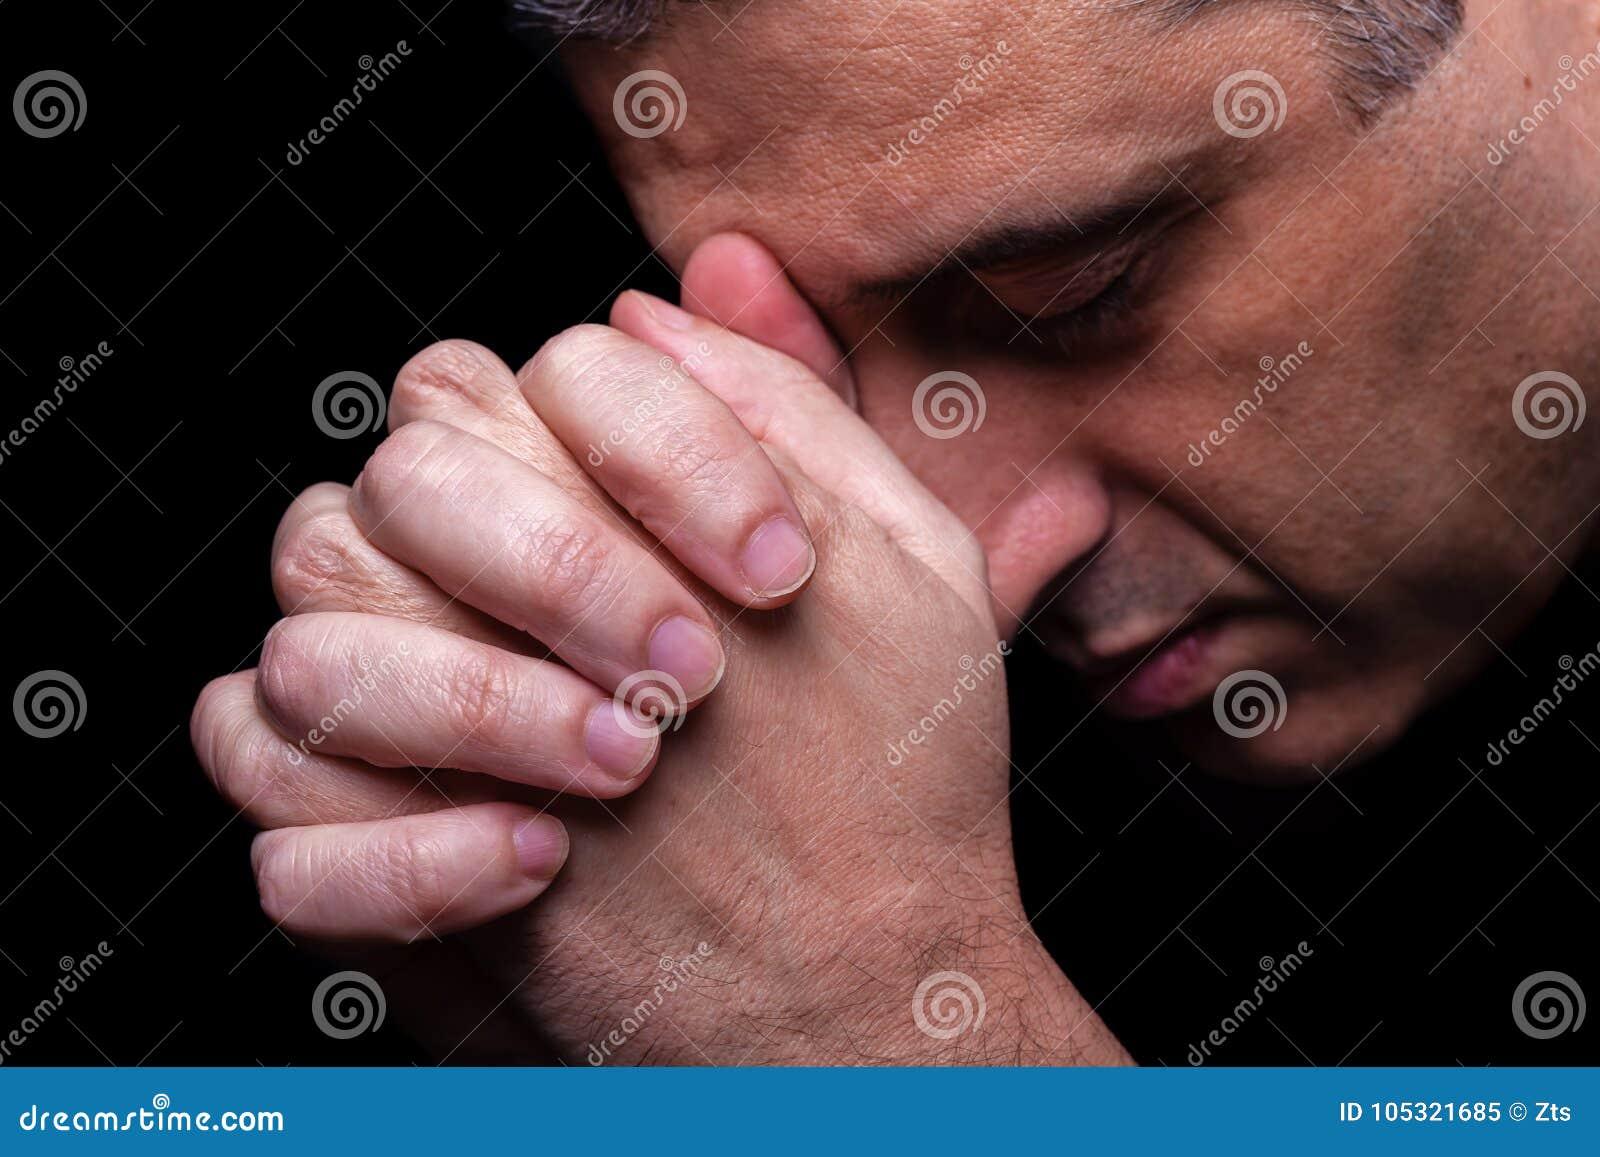 Close up of faithful mature man praying, hands folded in worship to god